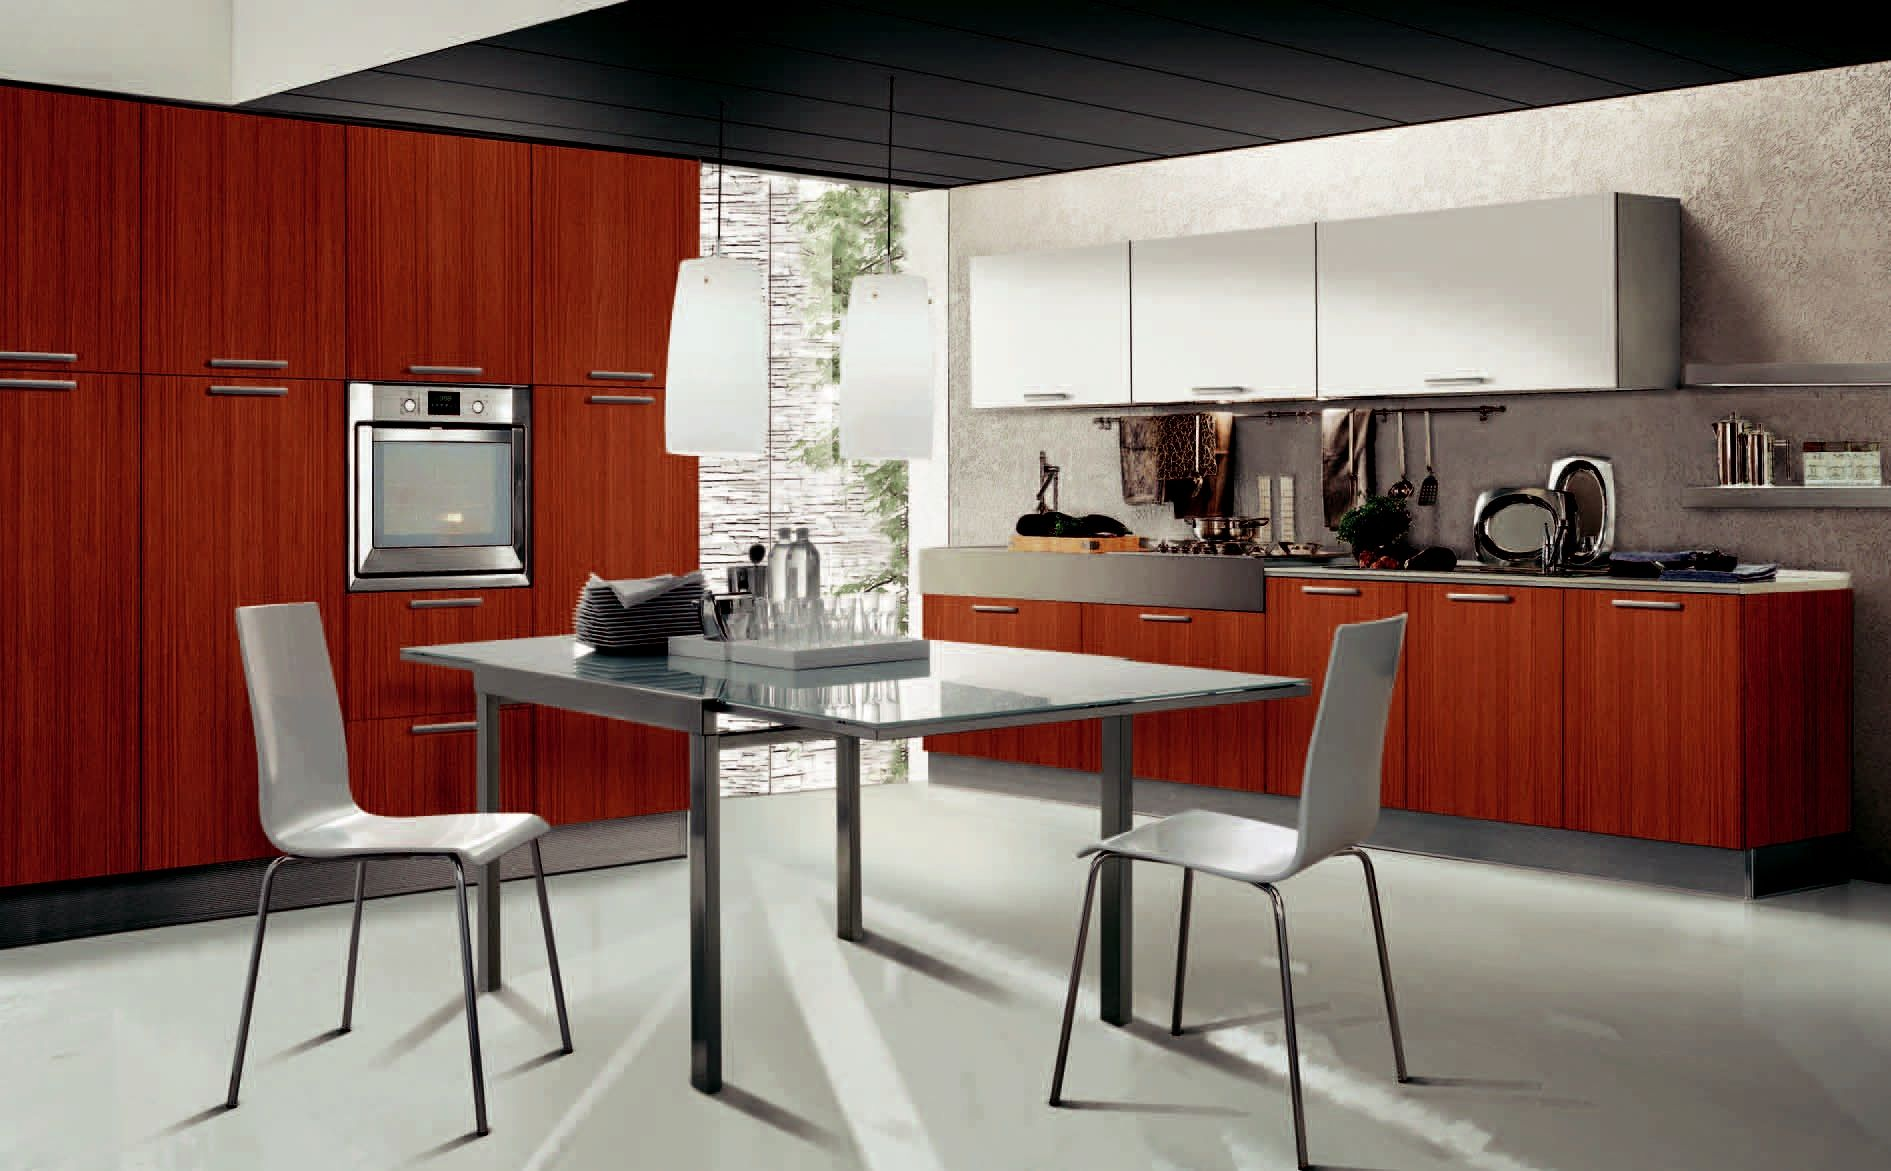 Innovativekitchenofficedesignideasswedishkitchendesignhome Endearing Small Office Kitchen Design Ideas Review